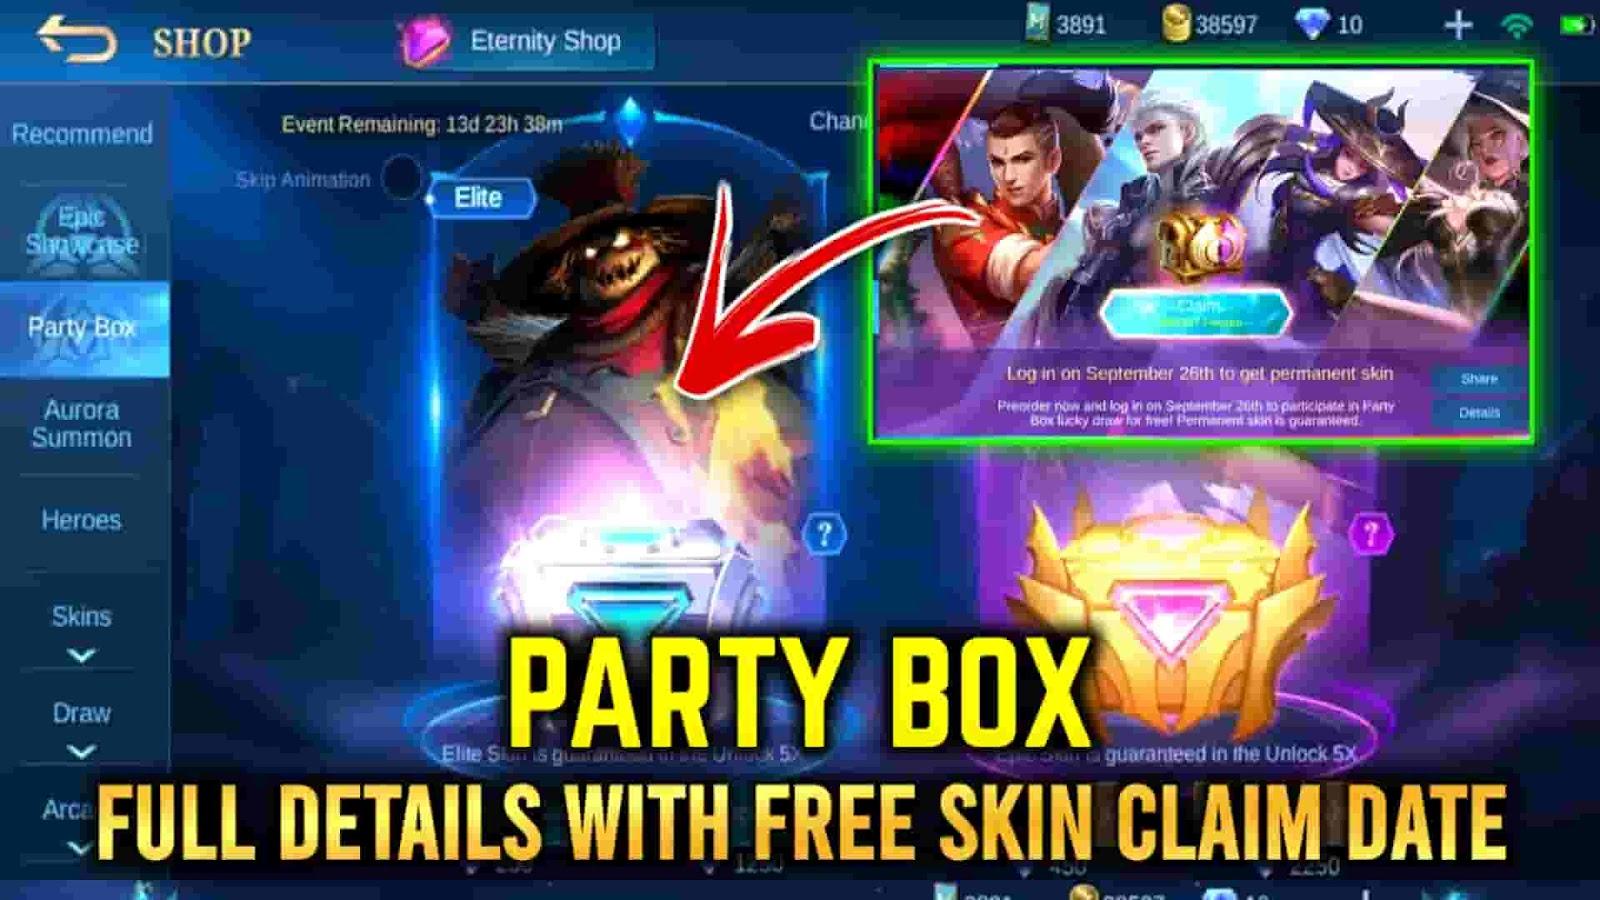 mlbb party box,ml party box draw,party box mlbb,mobile legends party box event